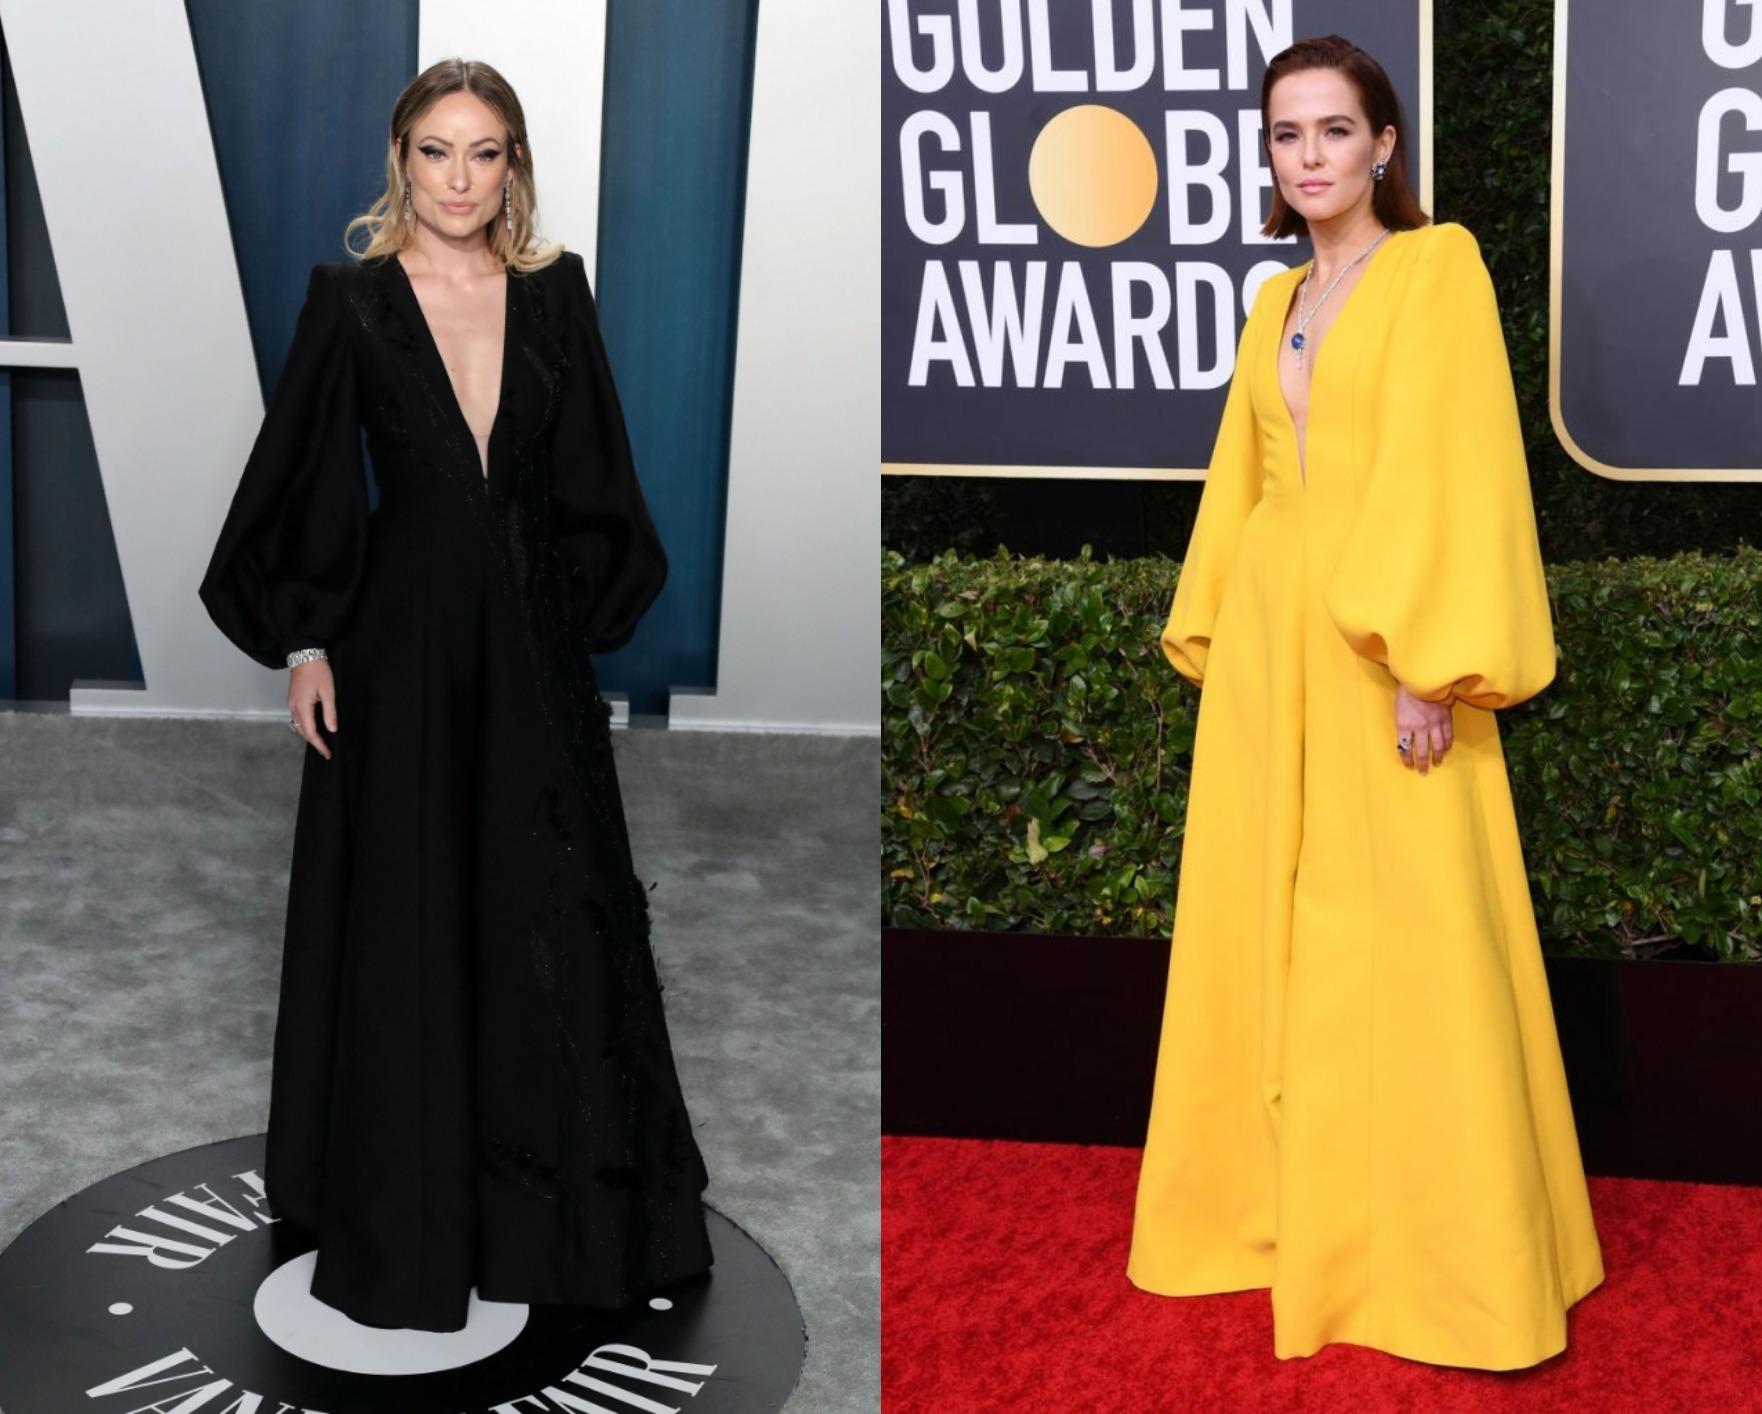 Cui îi stă mai bine: Olivia Wilde sau Zoey Deutch?